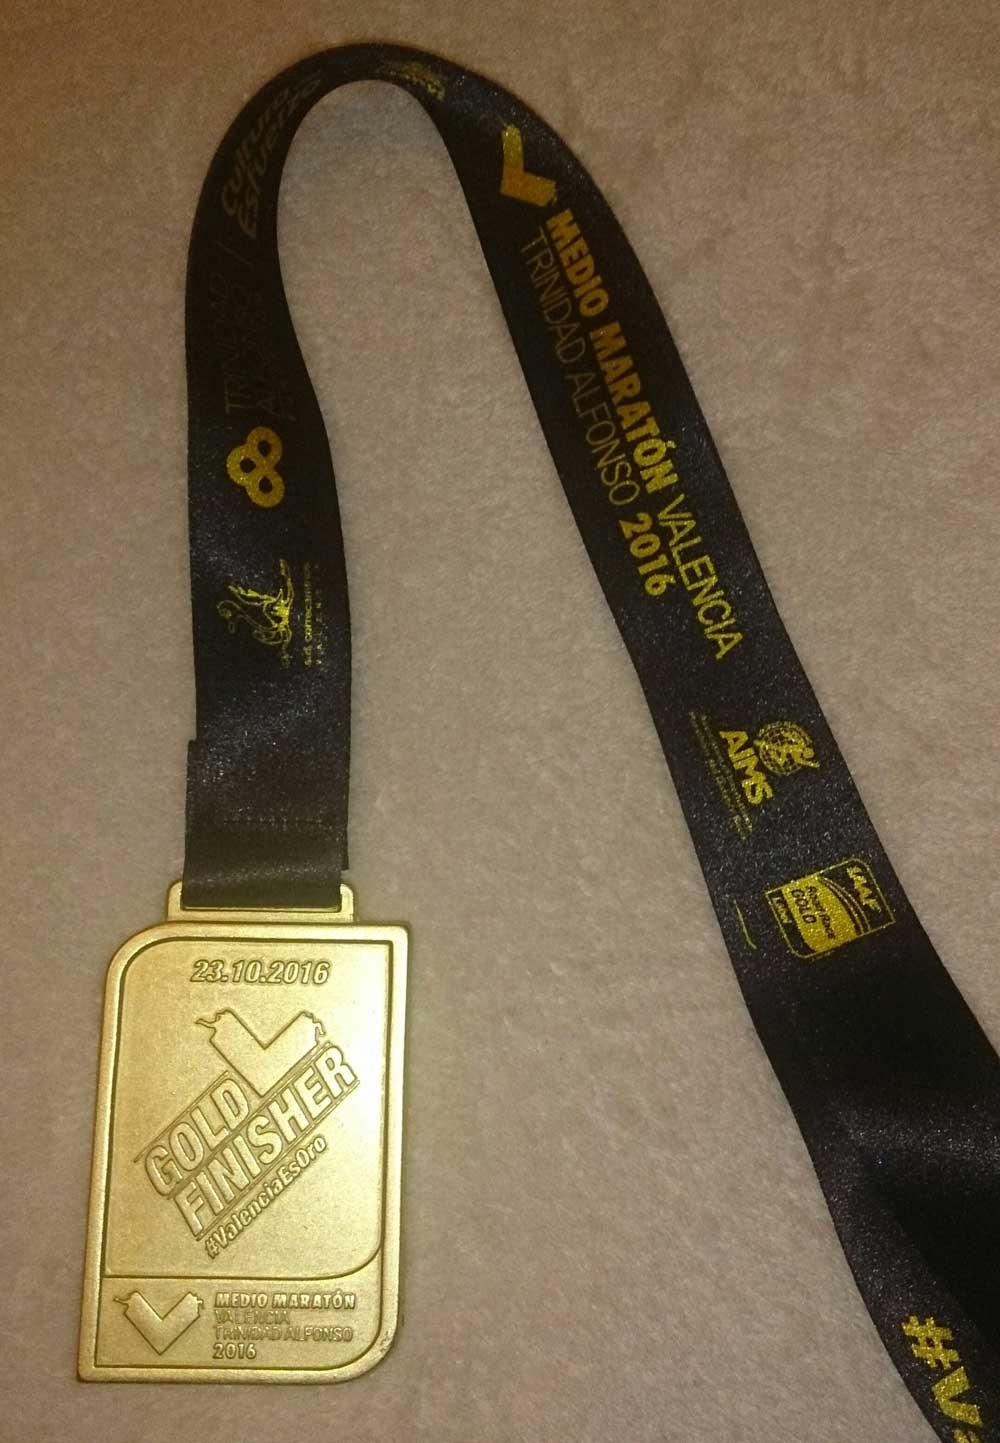 media-maraton-valencia-2016-medalla